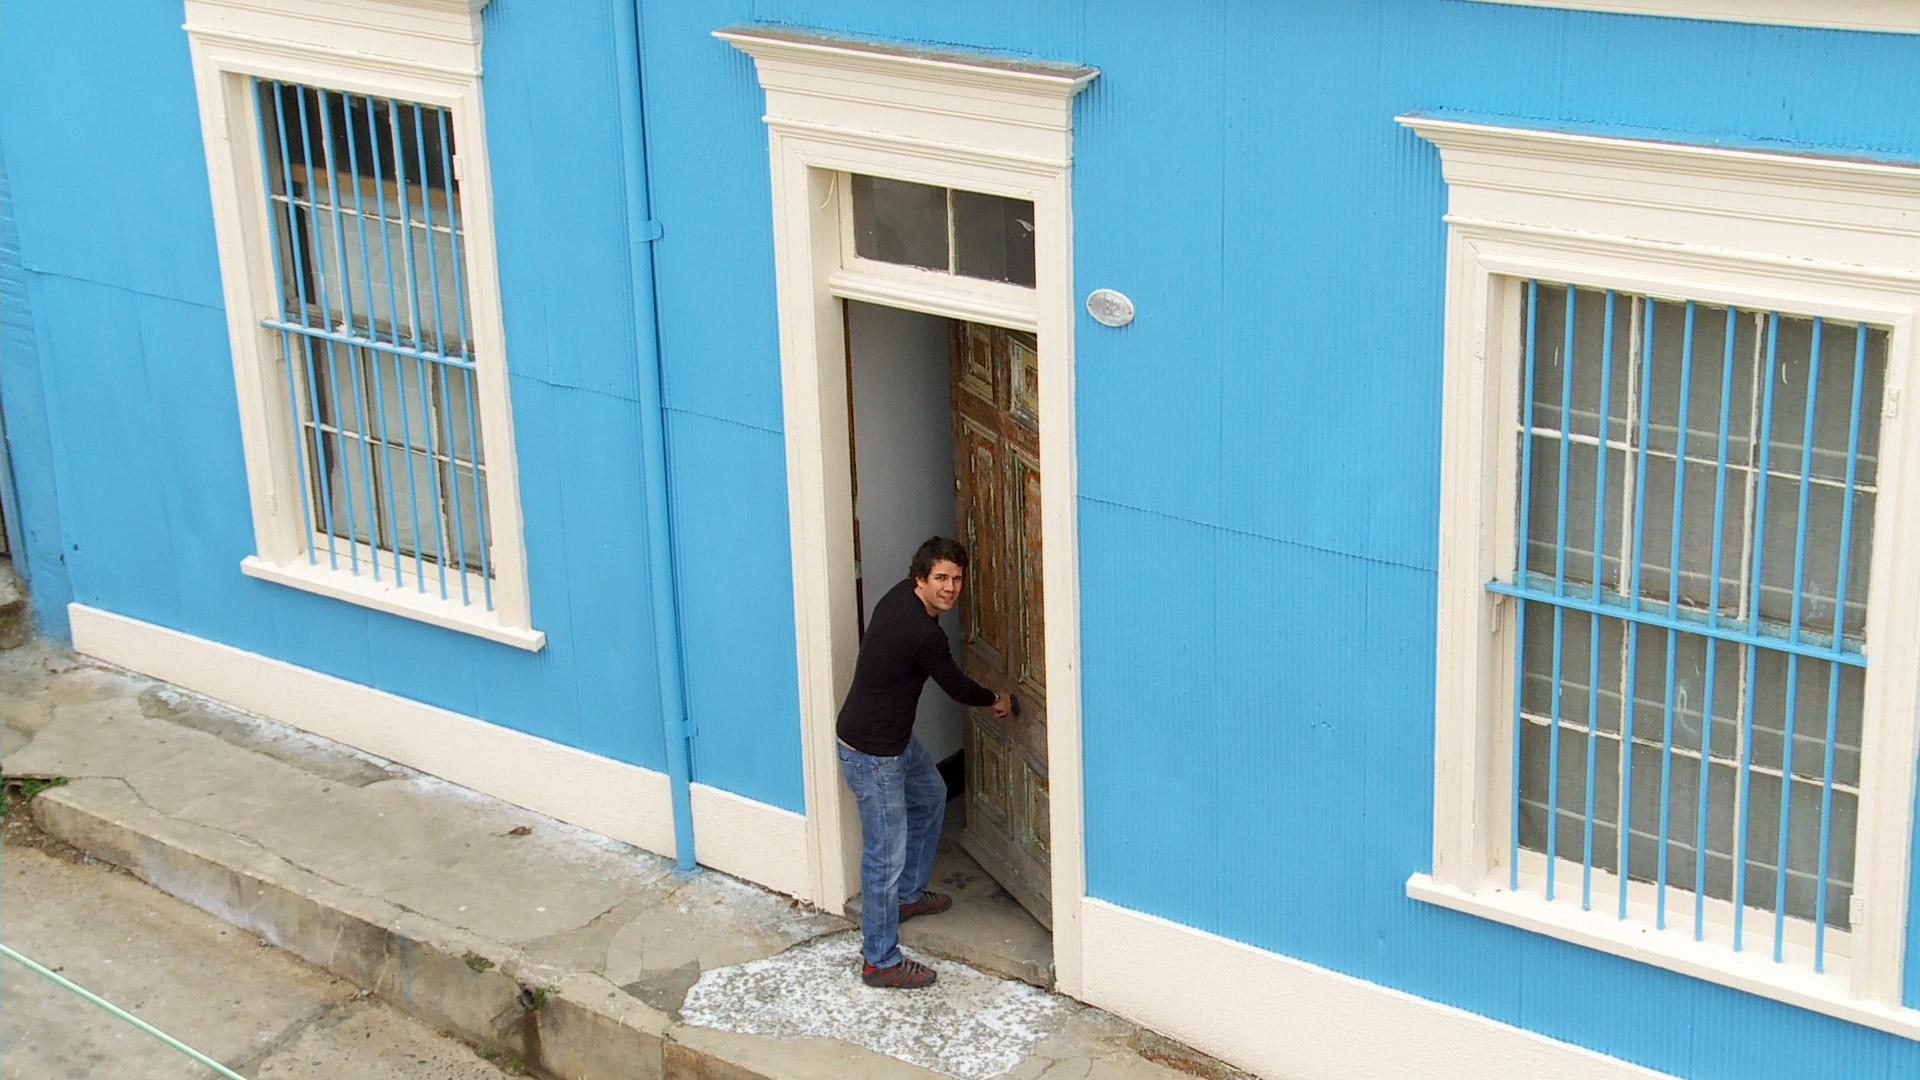 H galo usted mismo c mo pintar una fachada de zinc for Como pintar puertas de sapeli